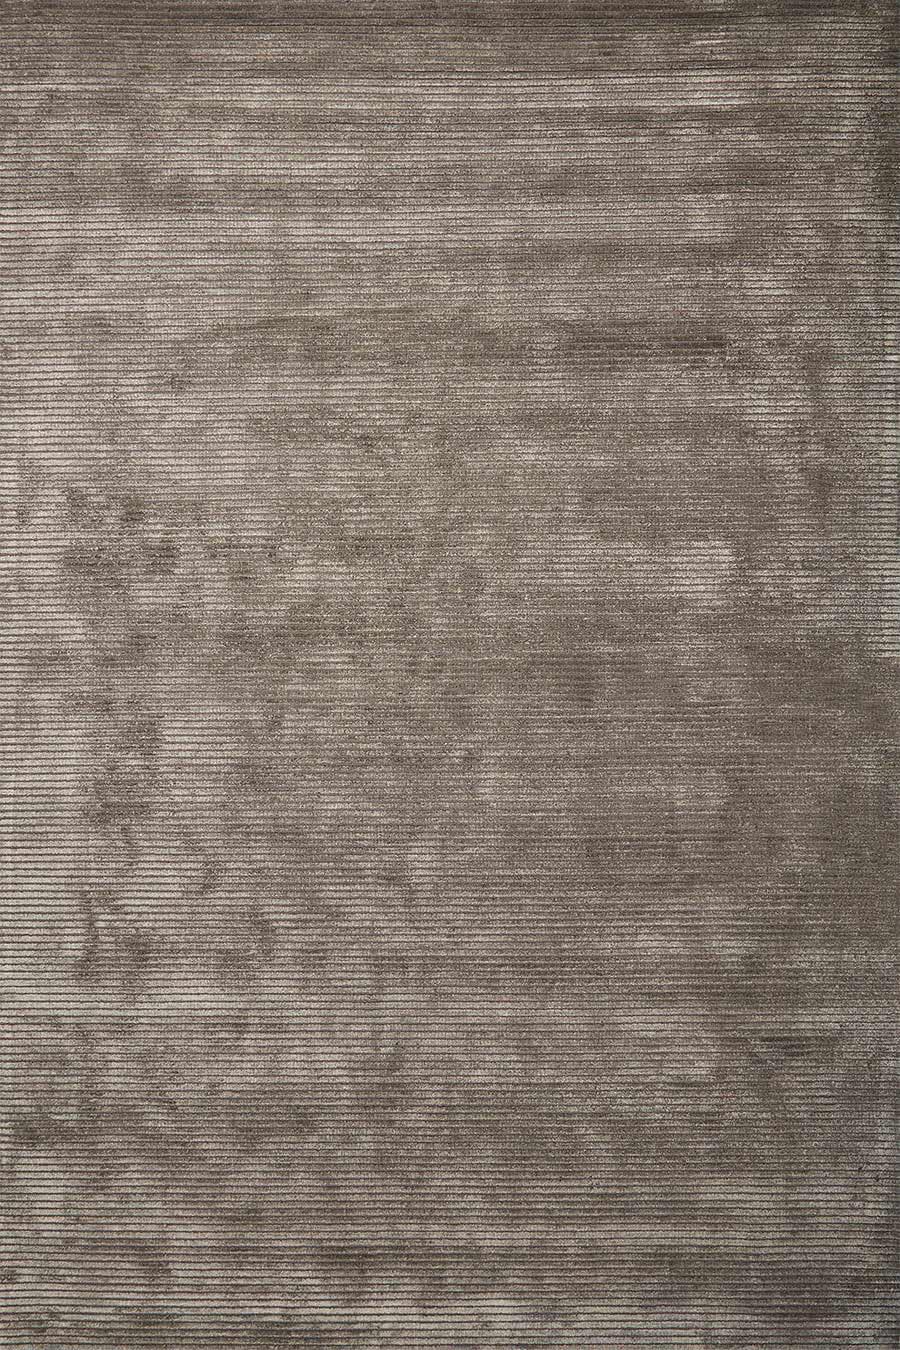 Overhead view of textured Velour rug in dark beige colour